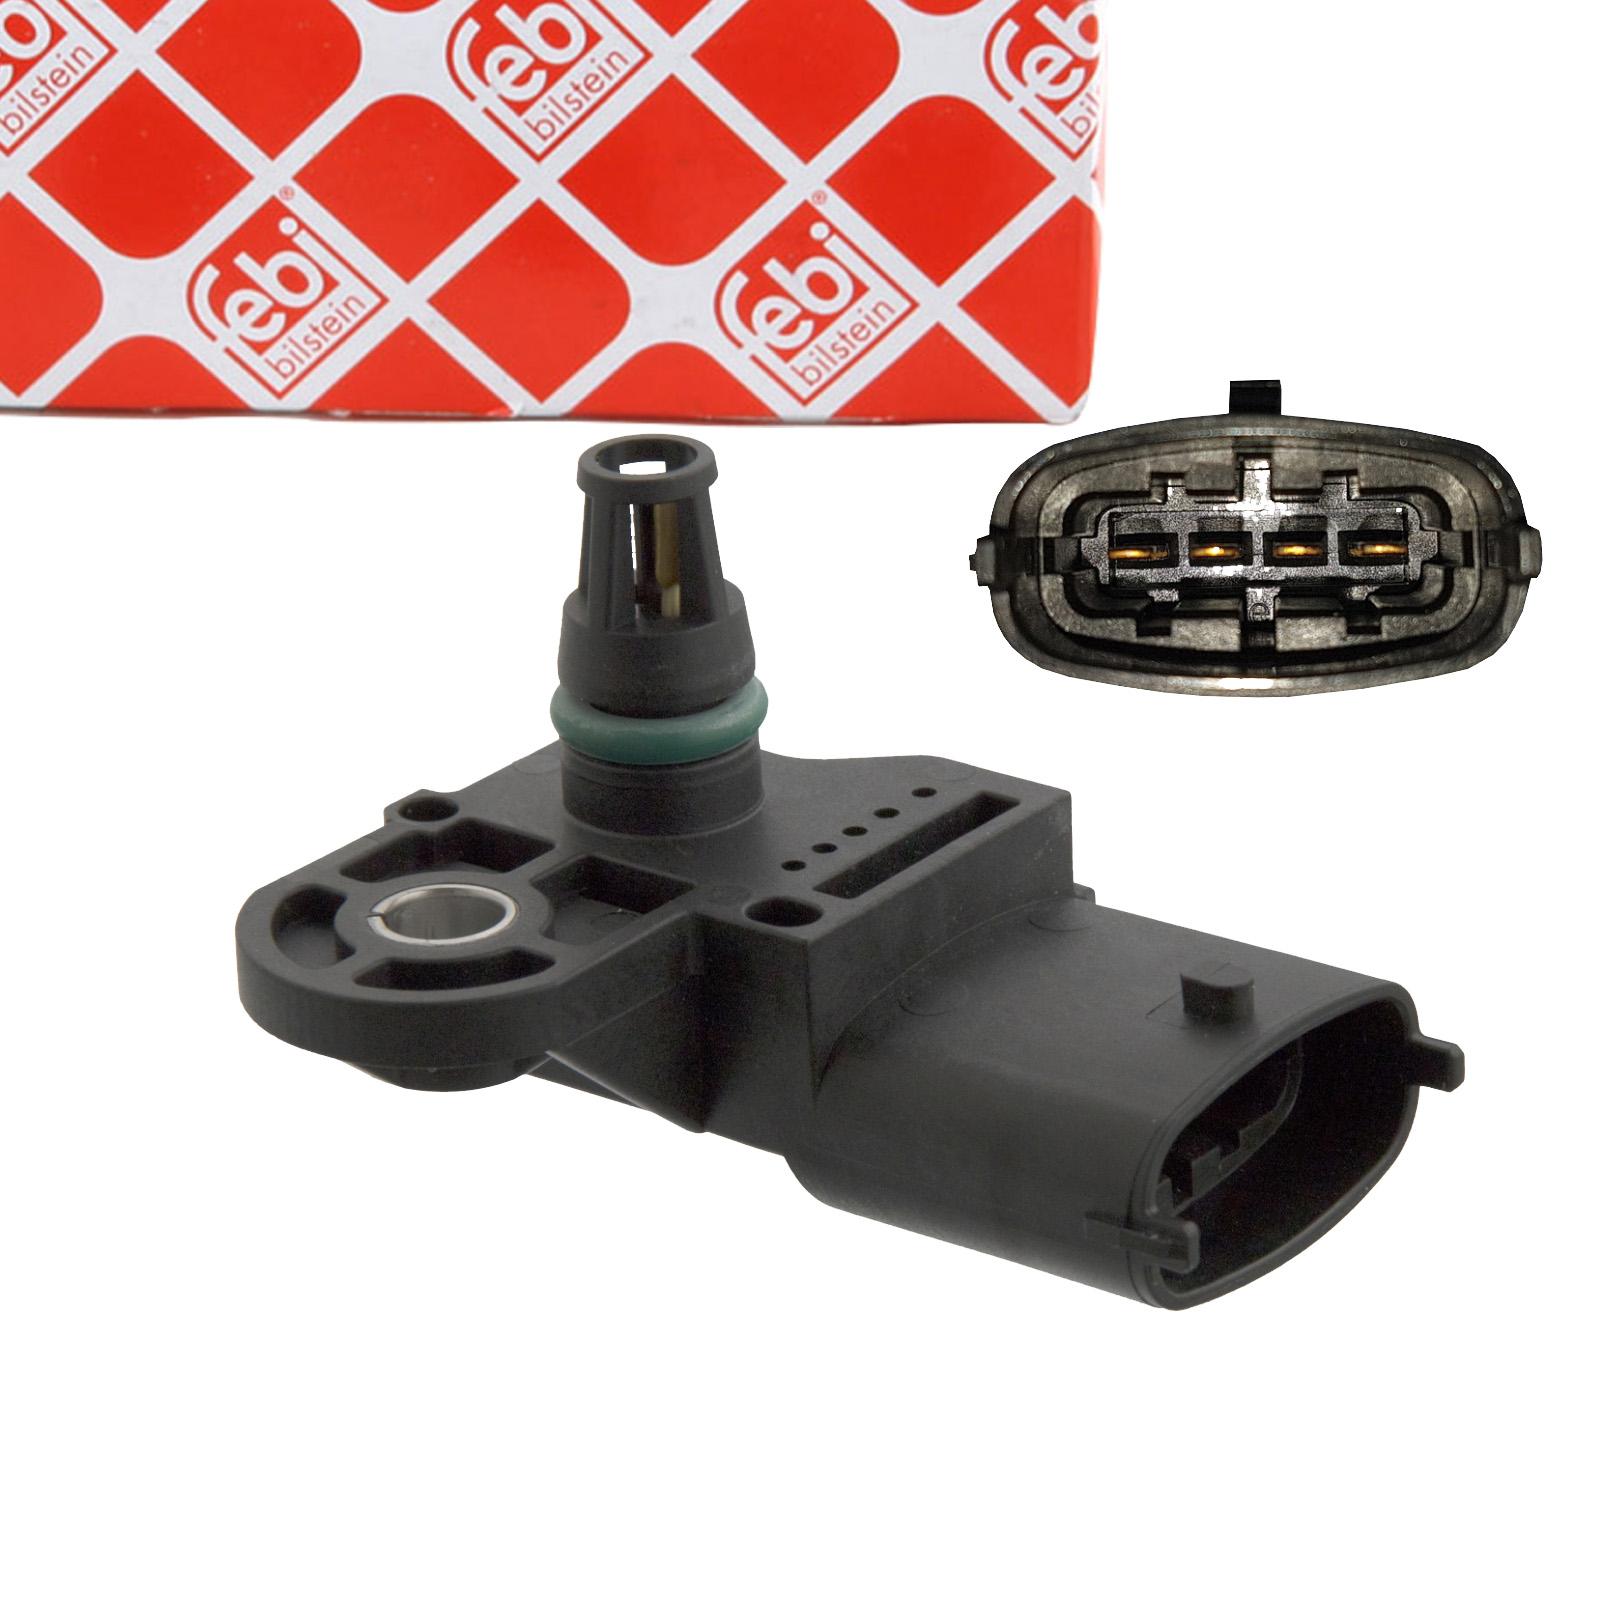 FEBI 101453 Saugrohrdrucksensor Sensor FIAT Ducato 230 244 2.3-2.8 JTD IVECO Daily 3